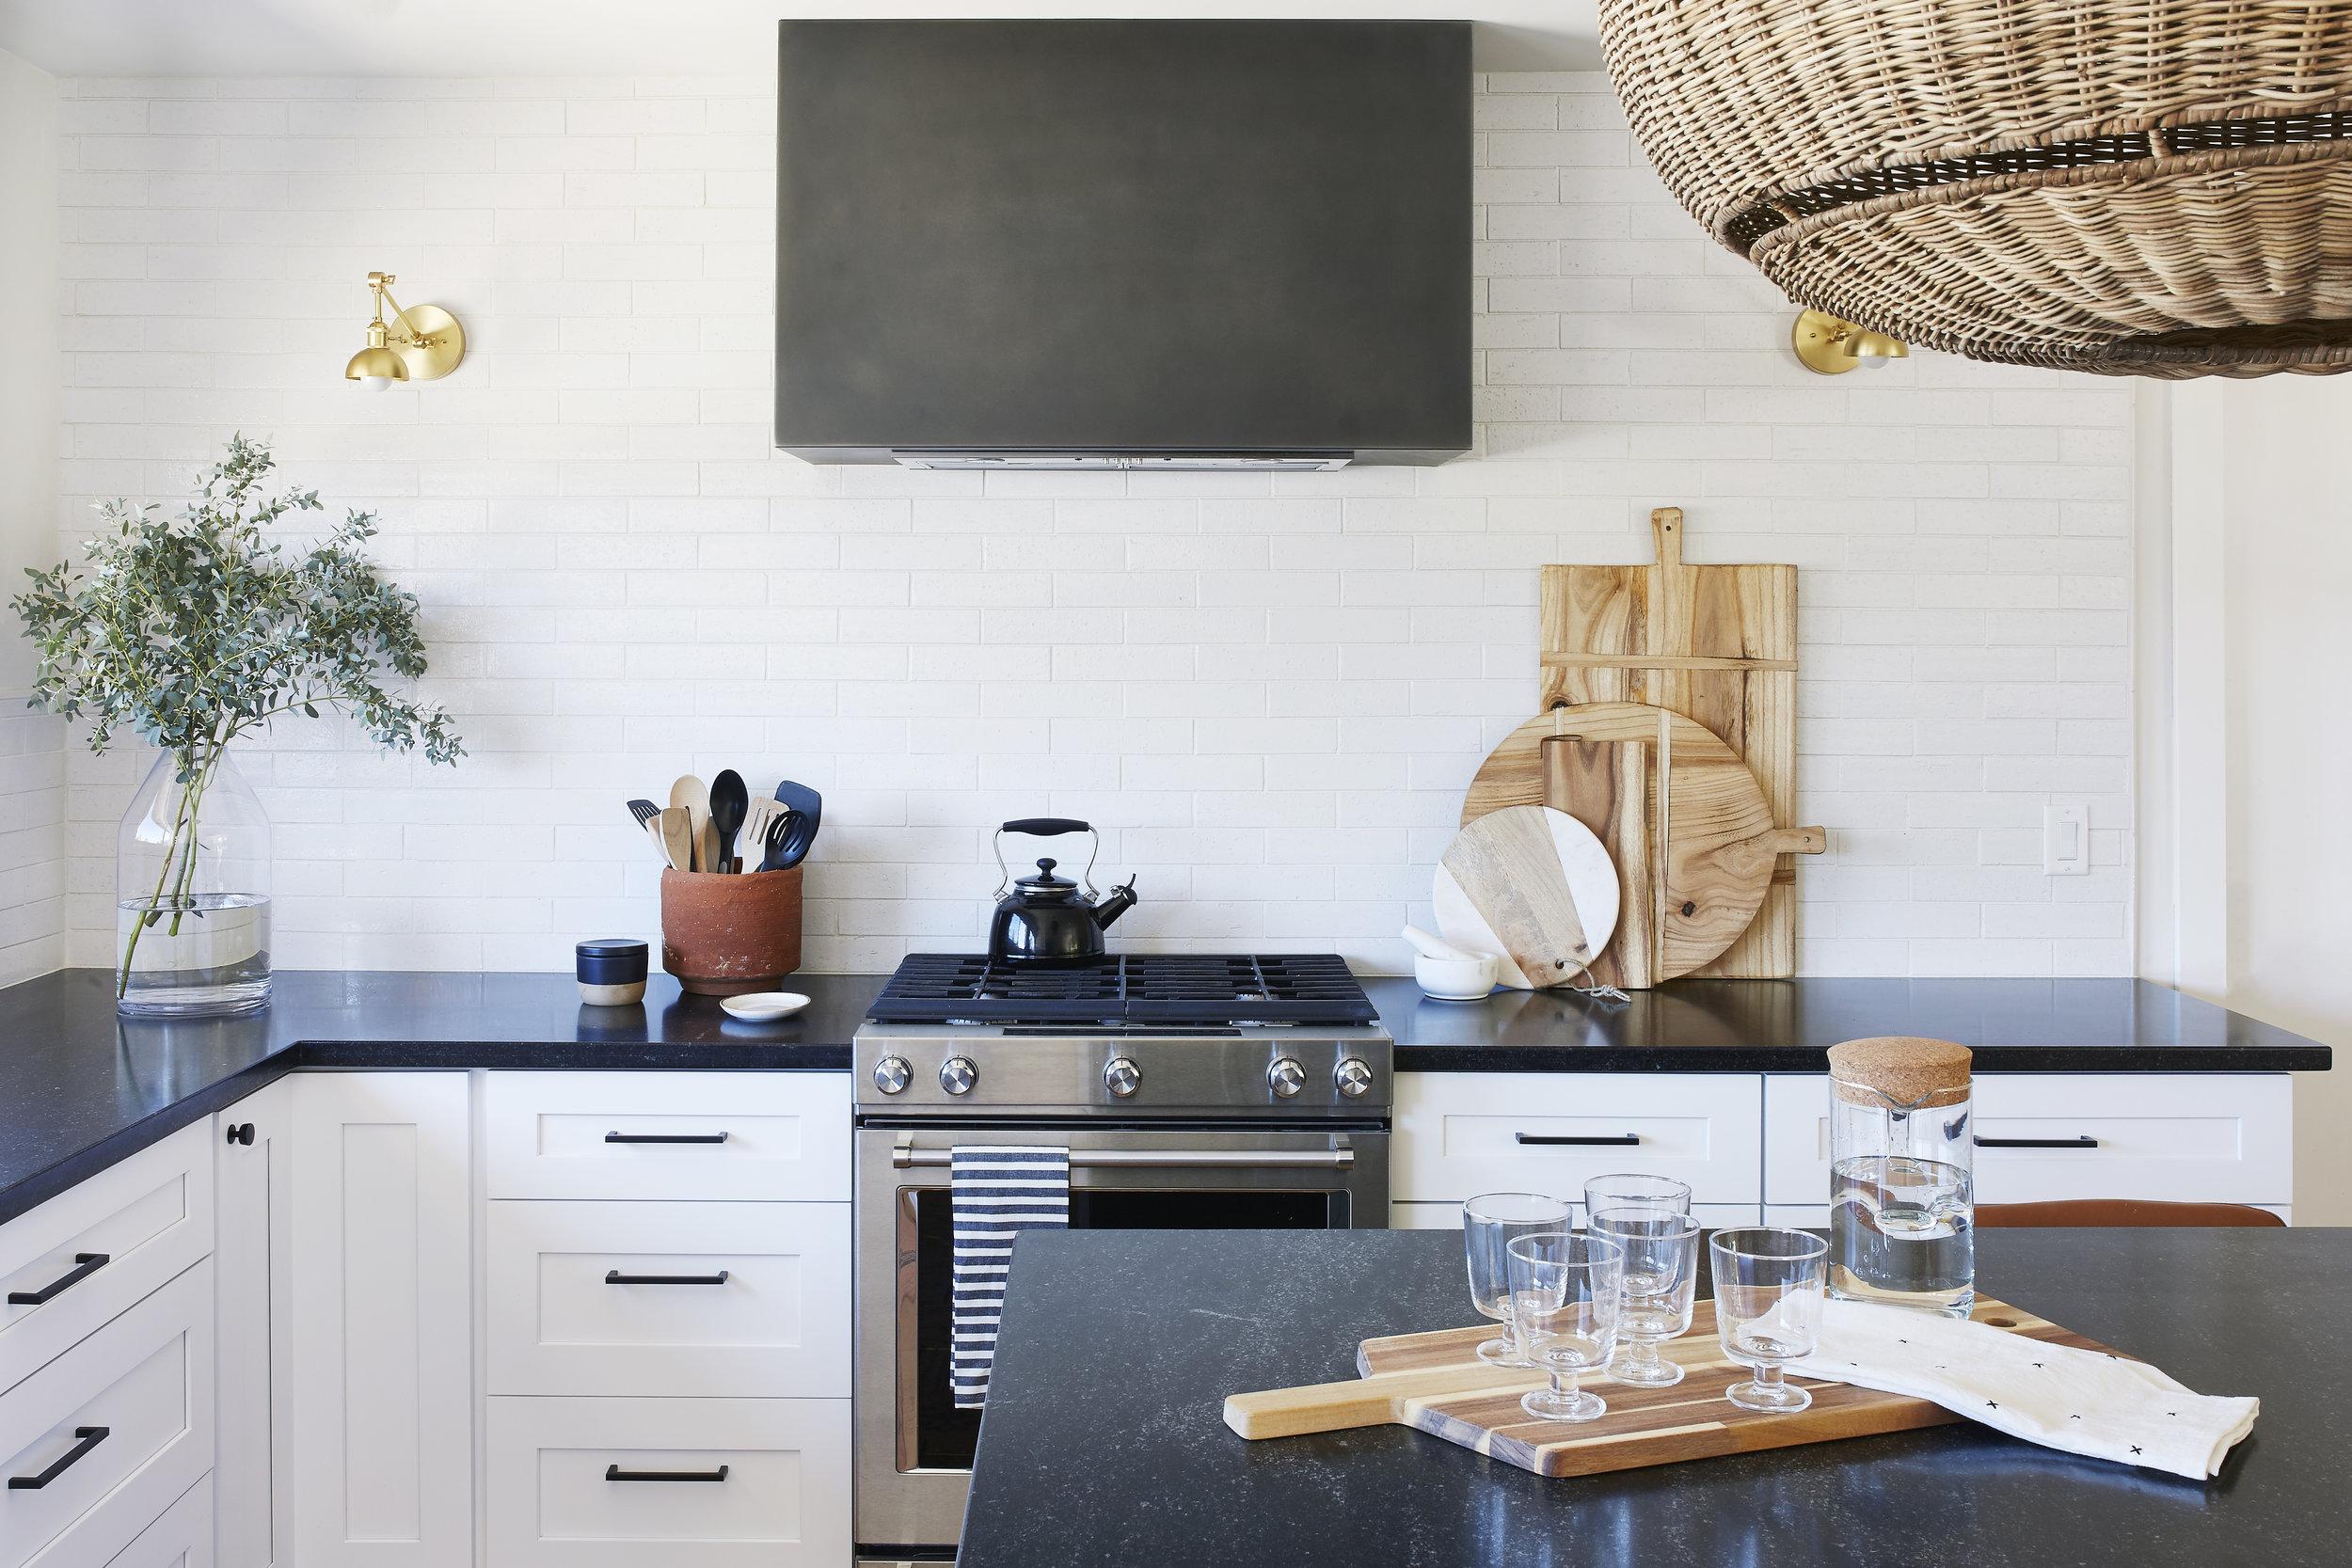 casey mason interiors | kitchen